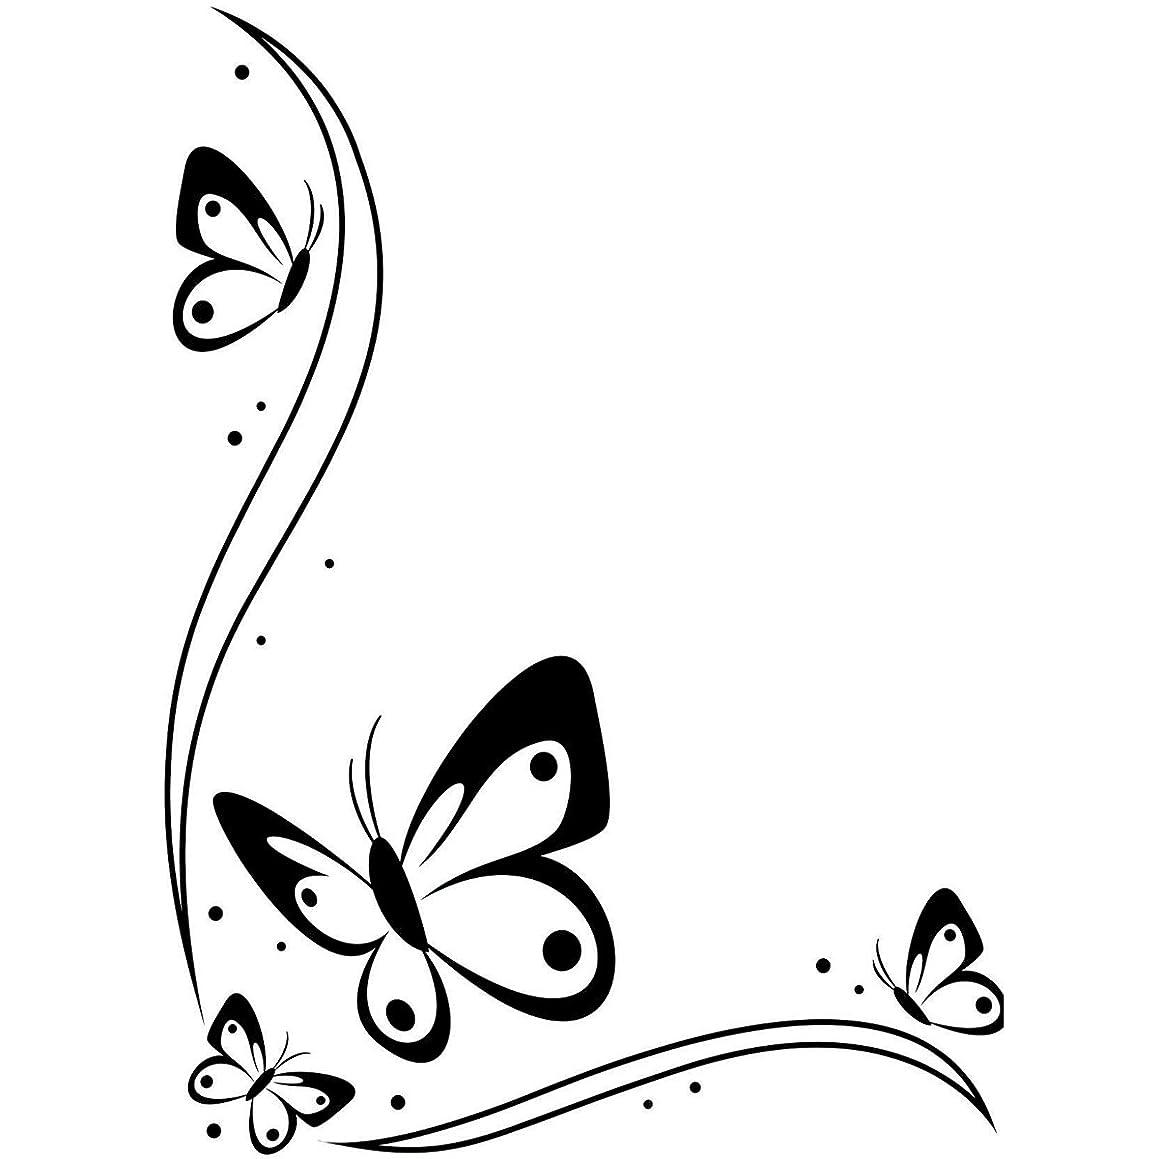 Darice 1218-107 Embossing Folder, 4.25 by 5.75-Inch, Butterflies in The Corner Design